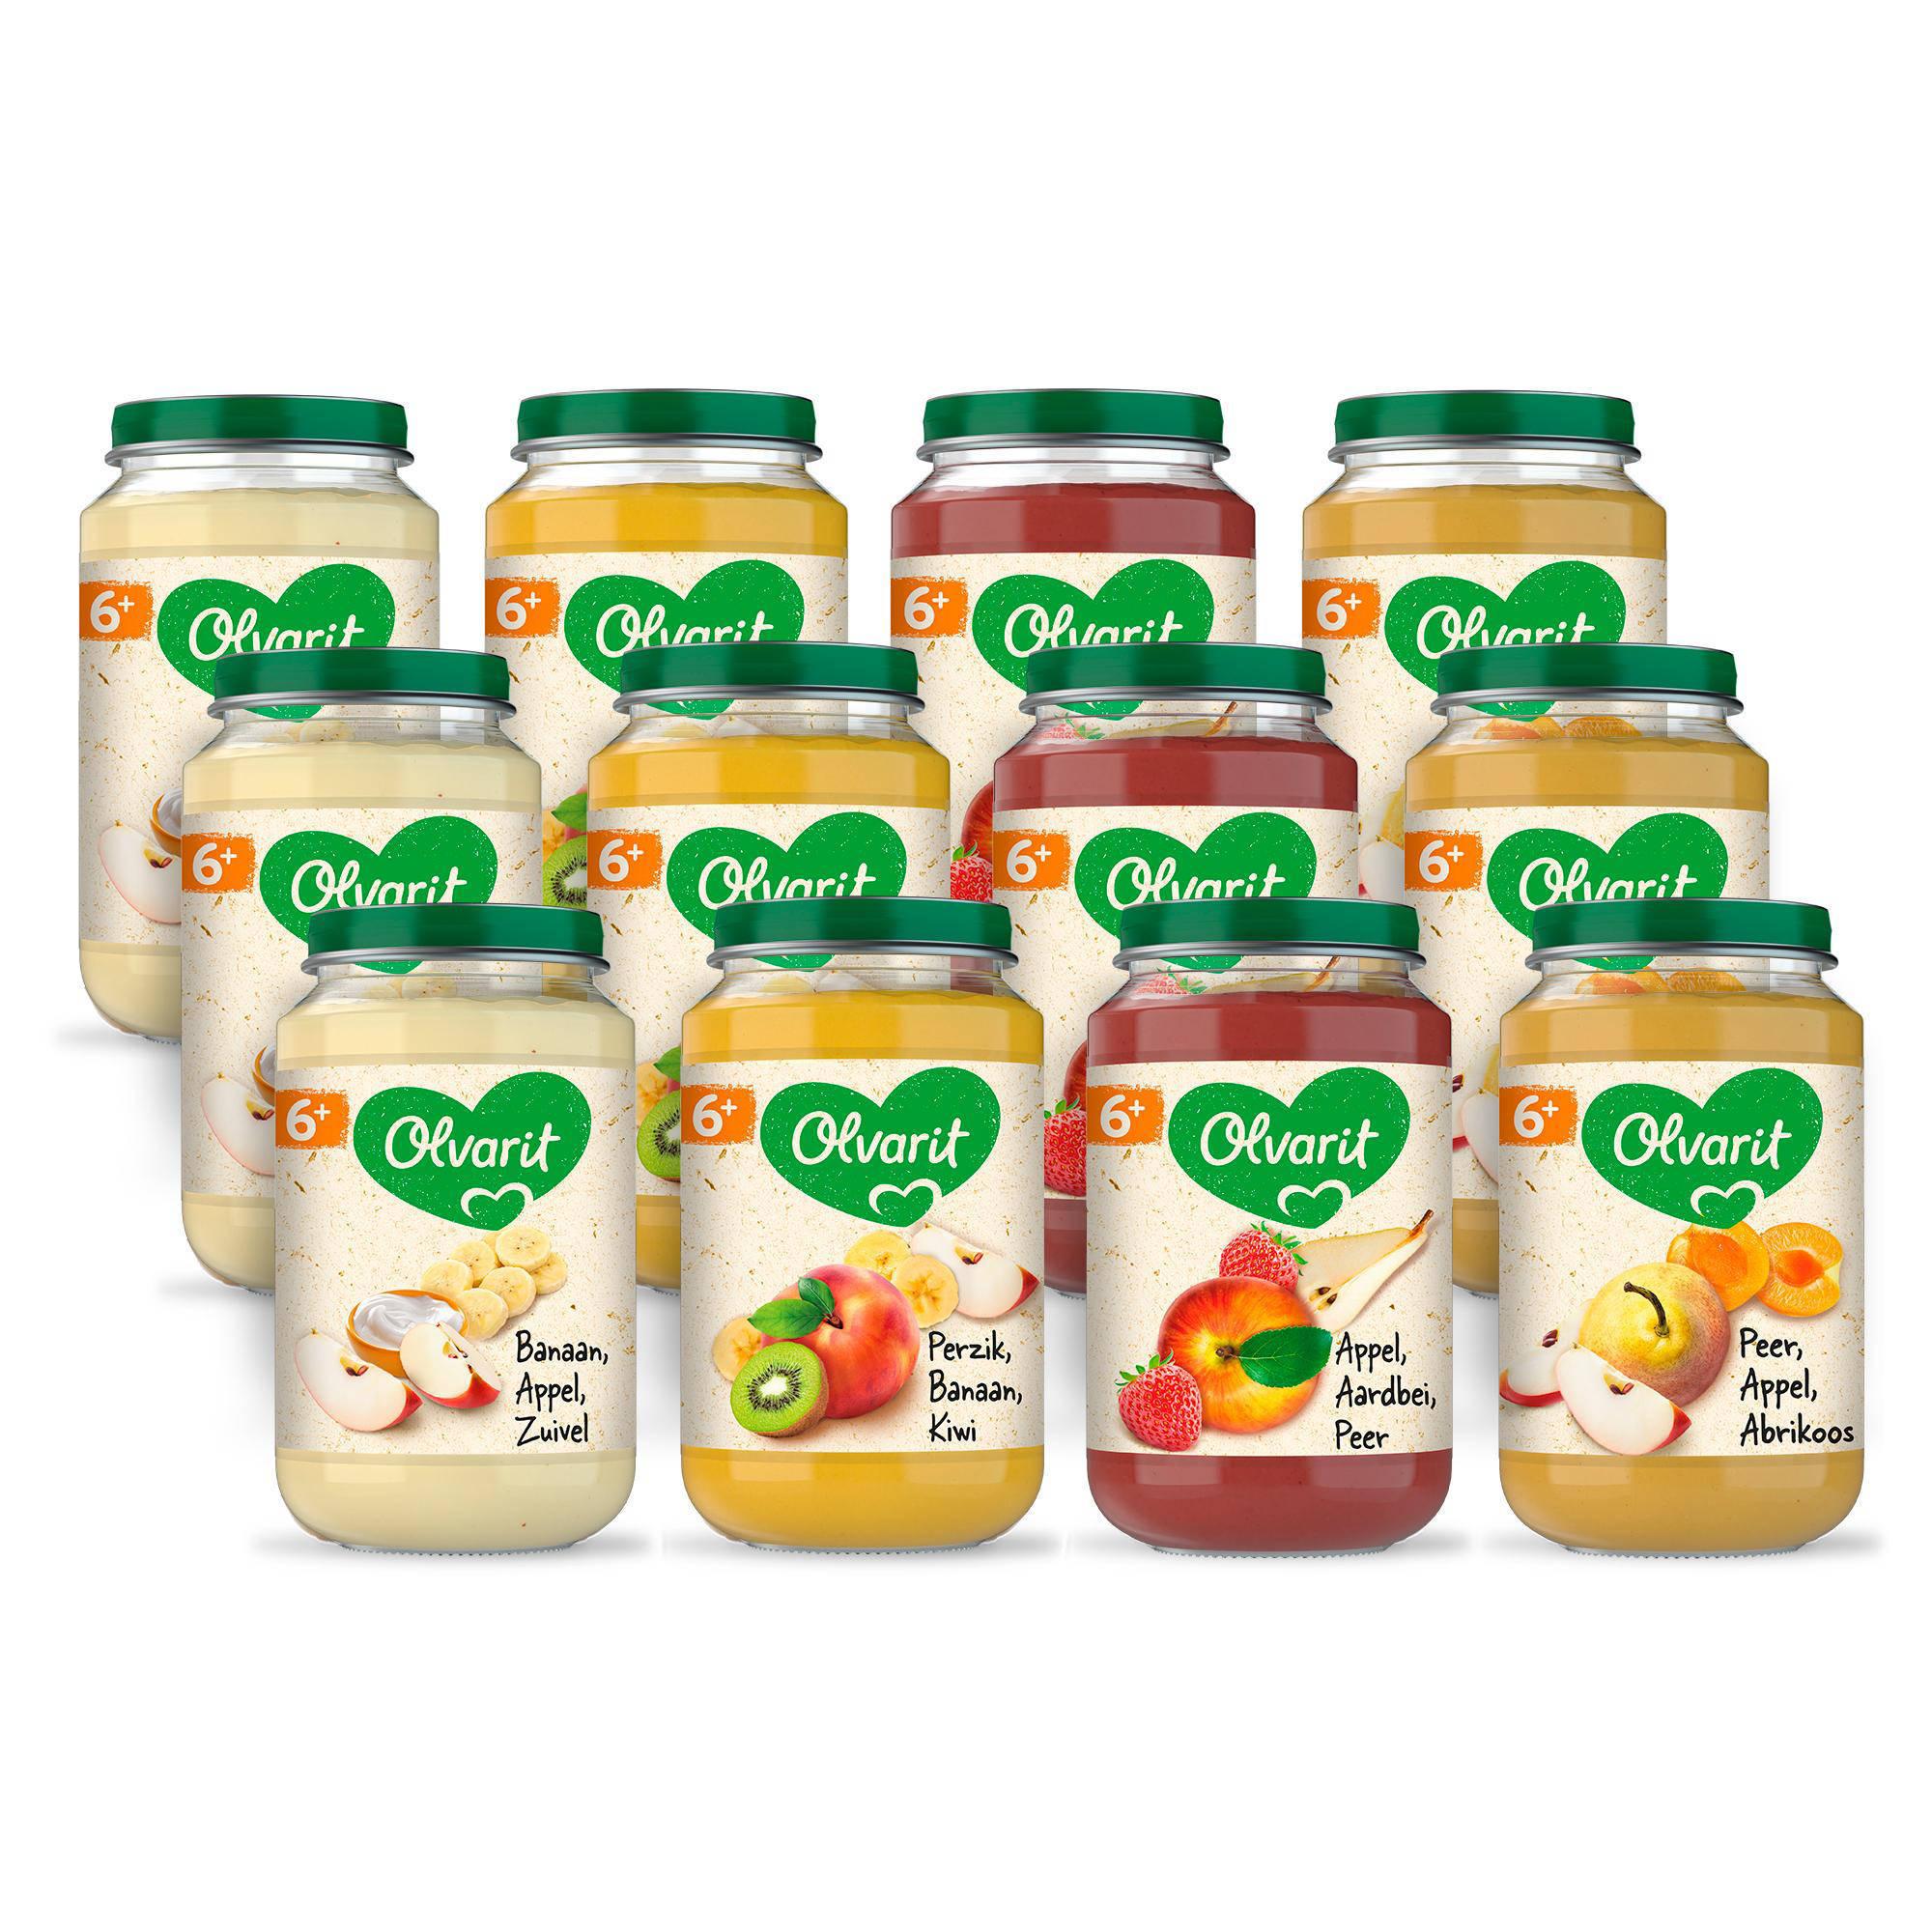 Olvarit babyvoeding menu 6+ mnd fruit (12x 200 gr)